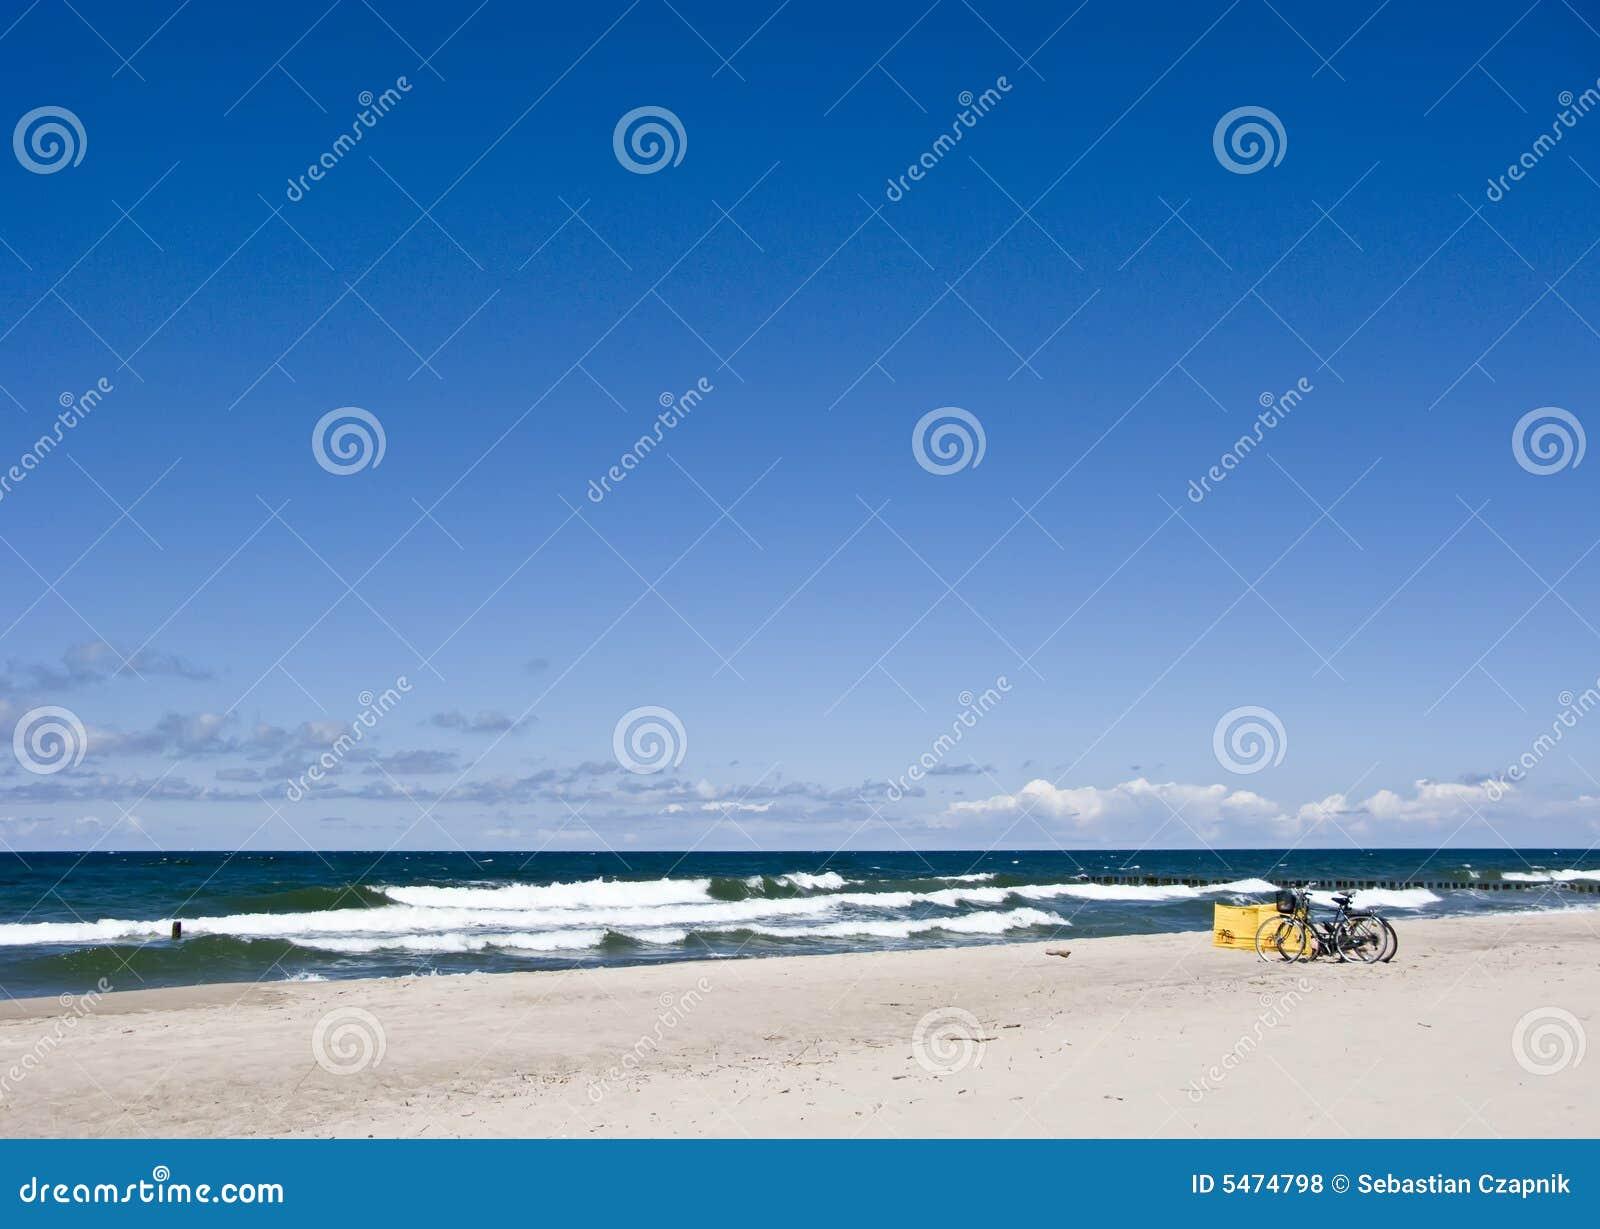 Vélos sur la plage